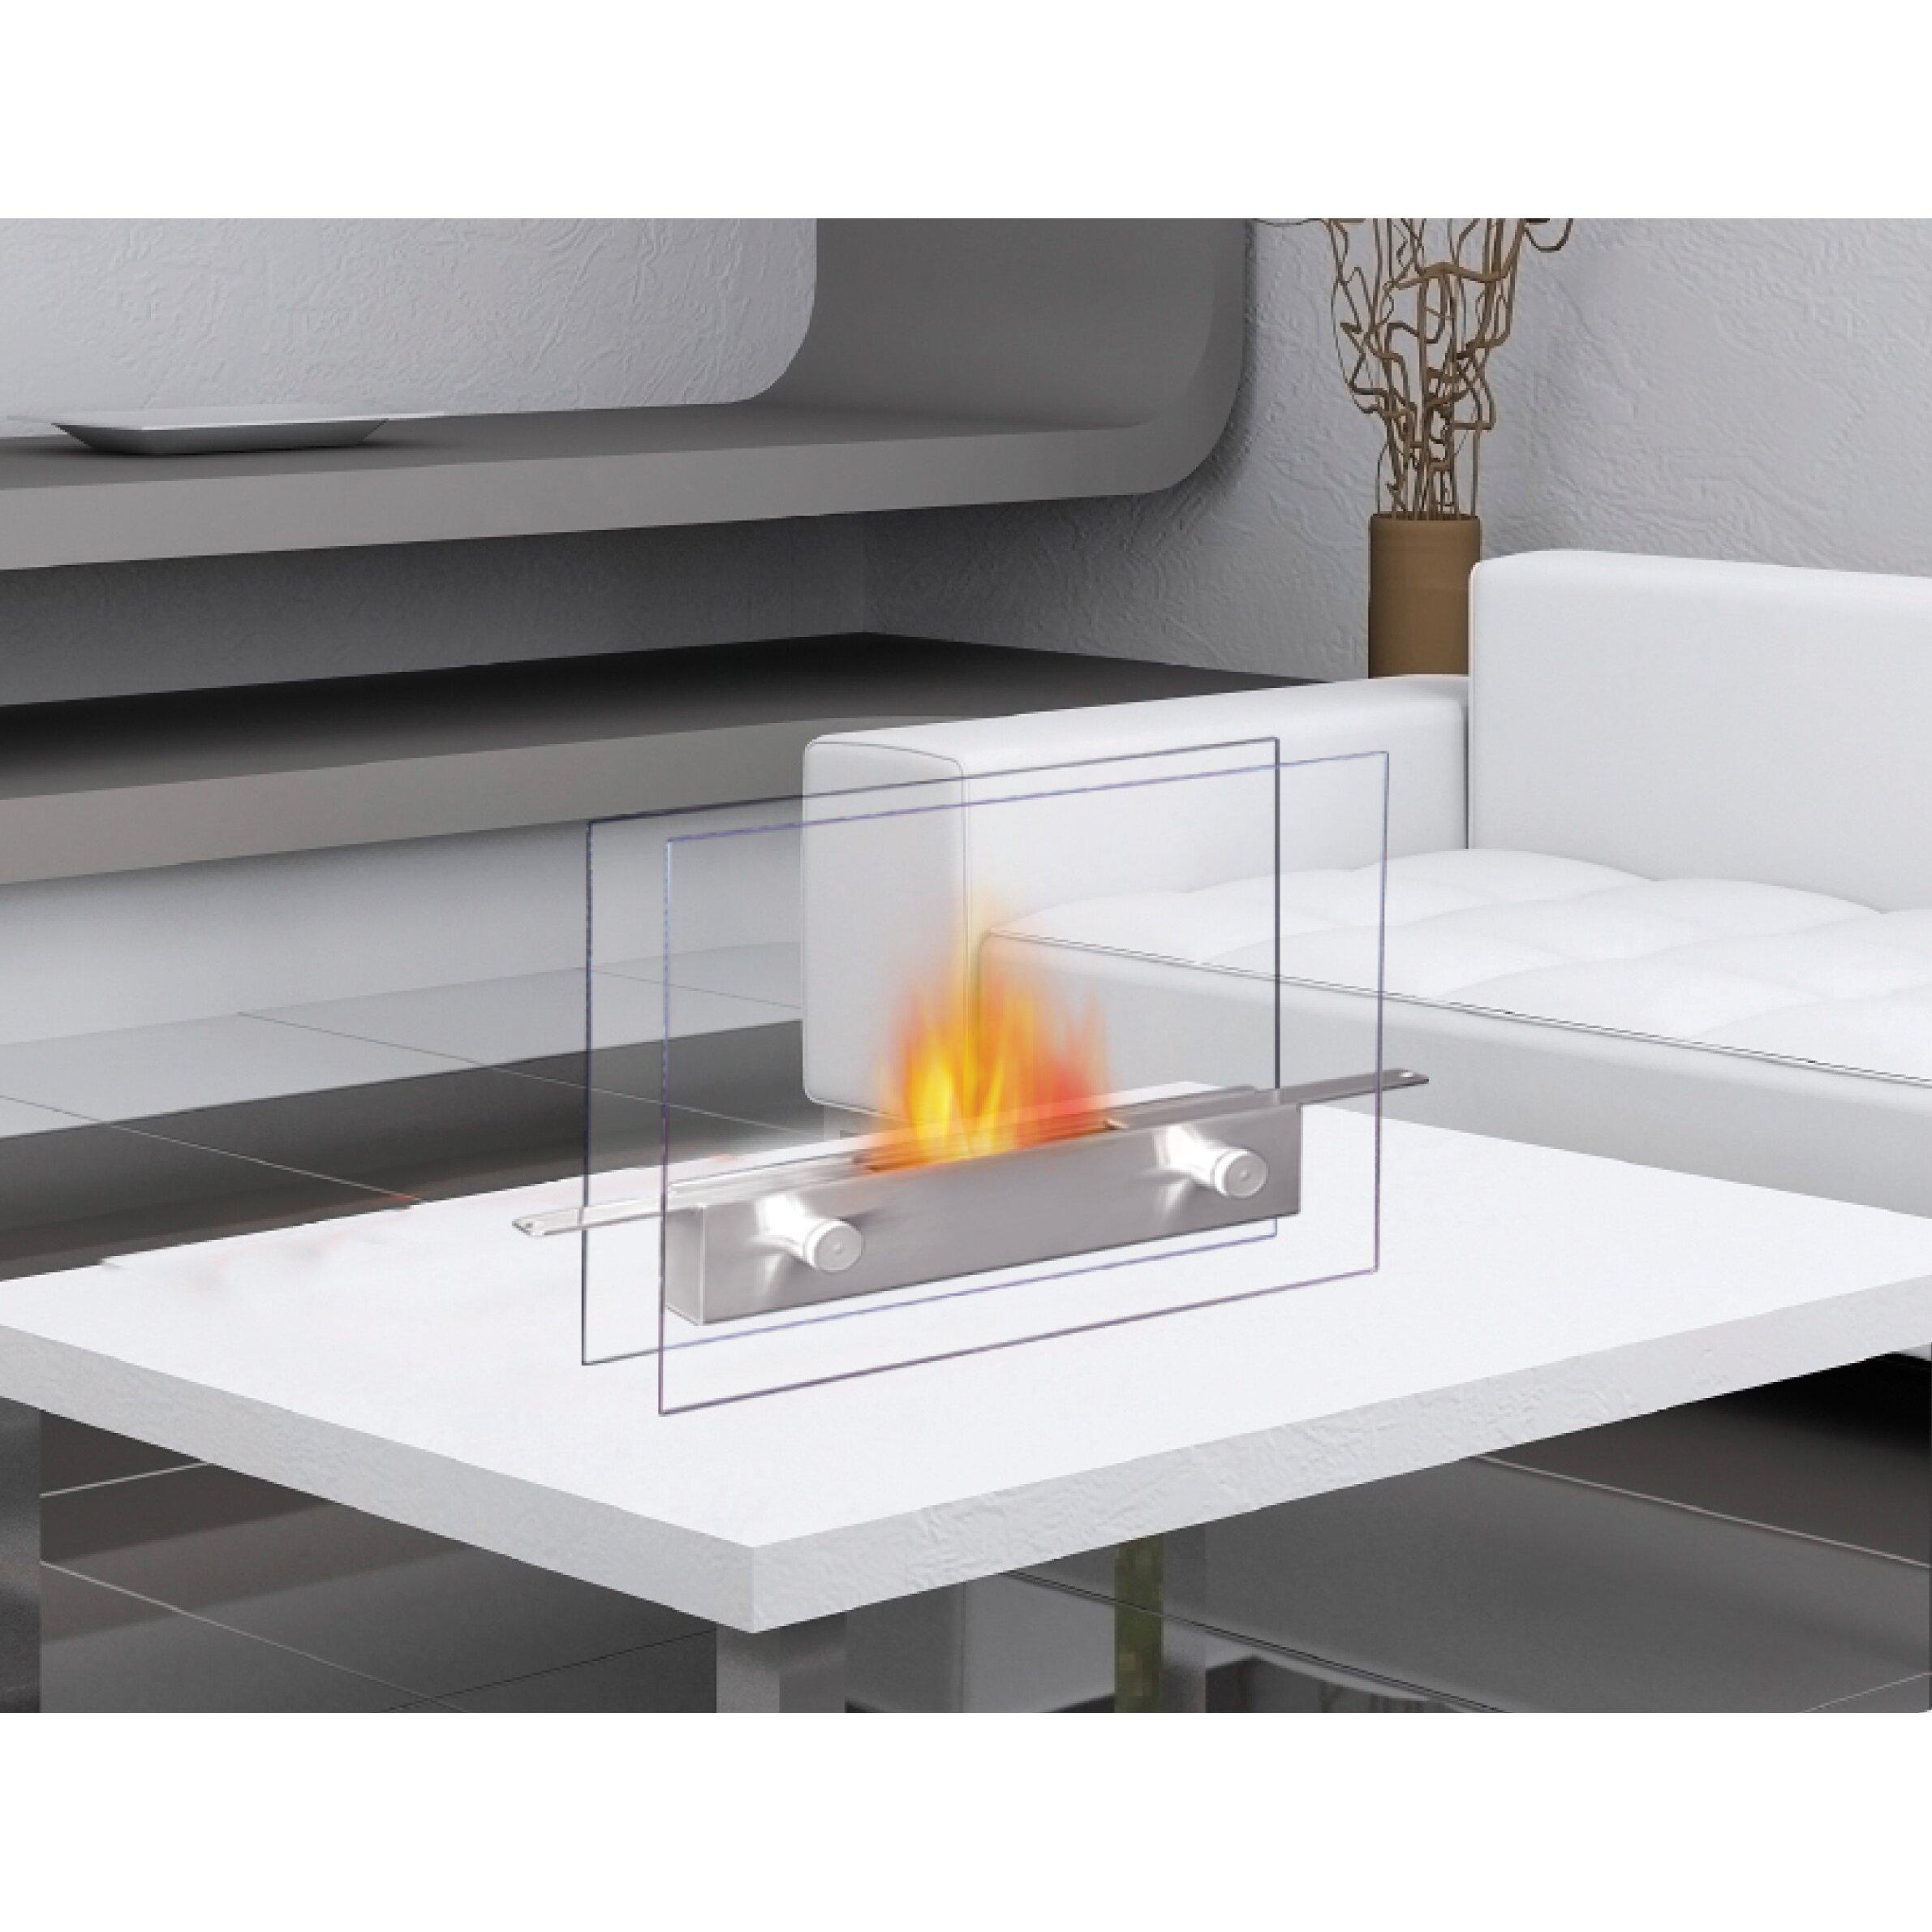 Anywhere Fireplaces Metropolitan Bio Ethanol Tabletop